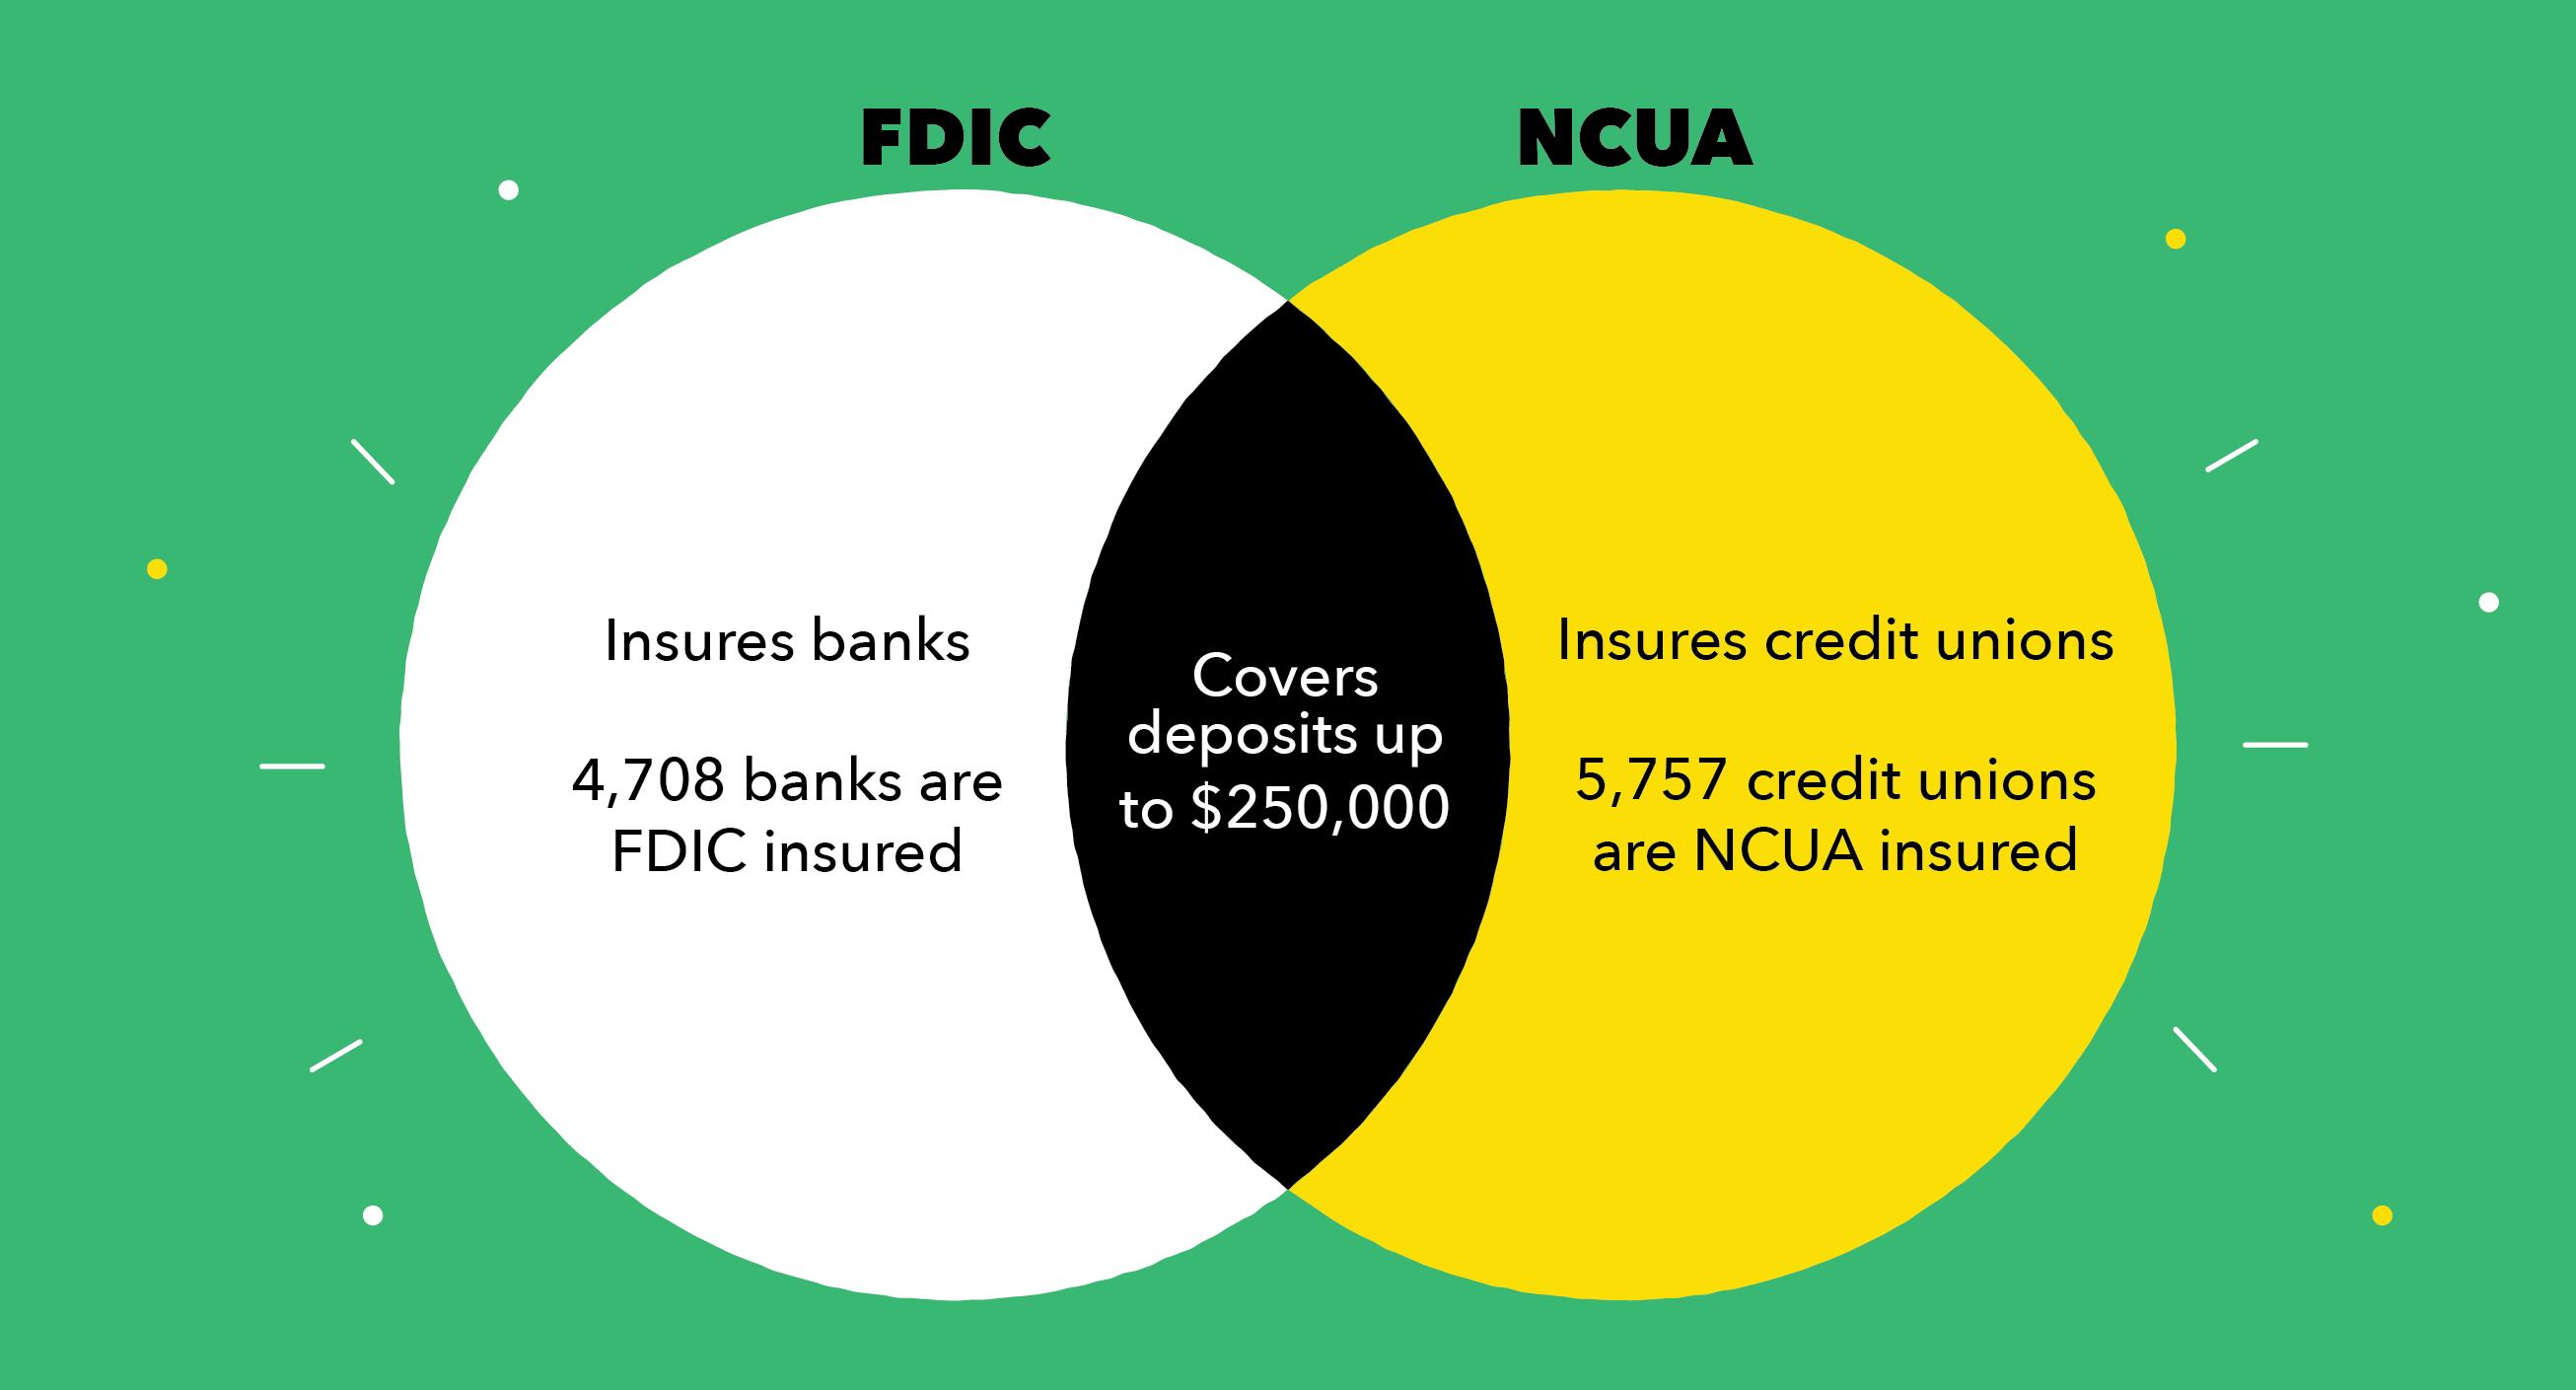 FDIC vs NCUA